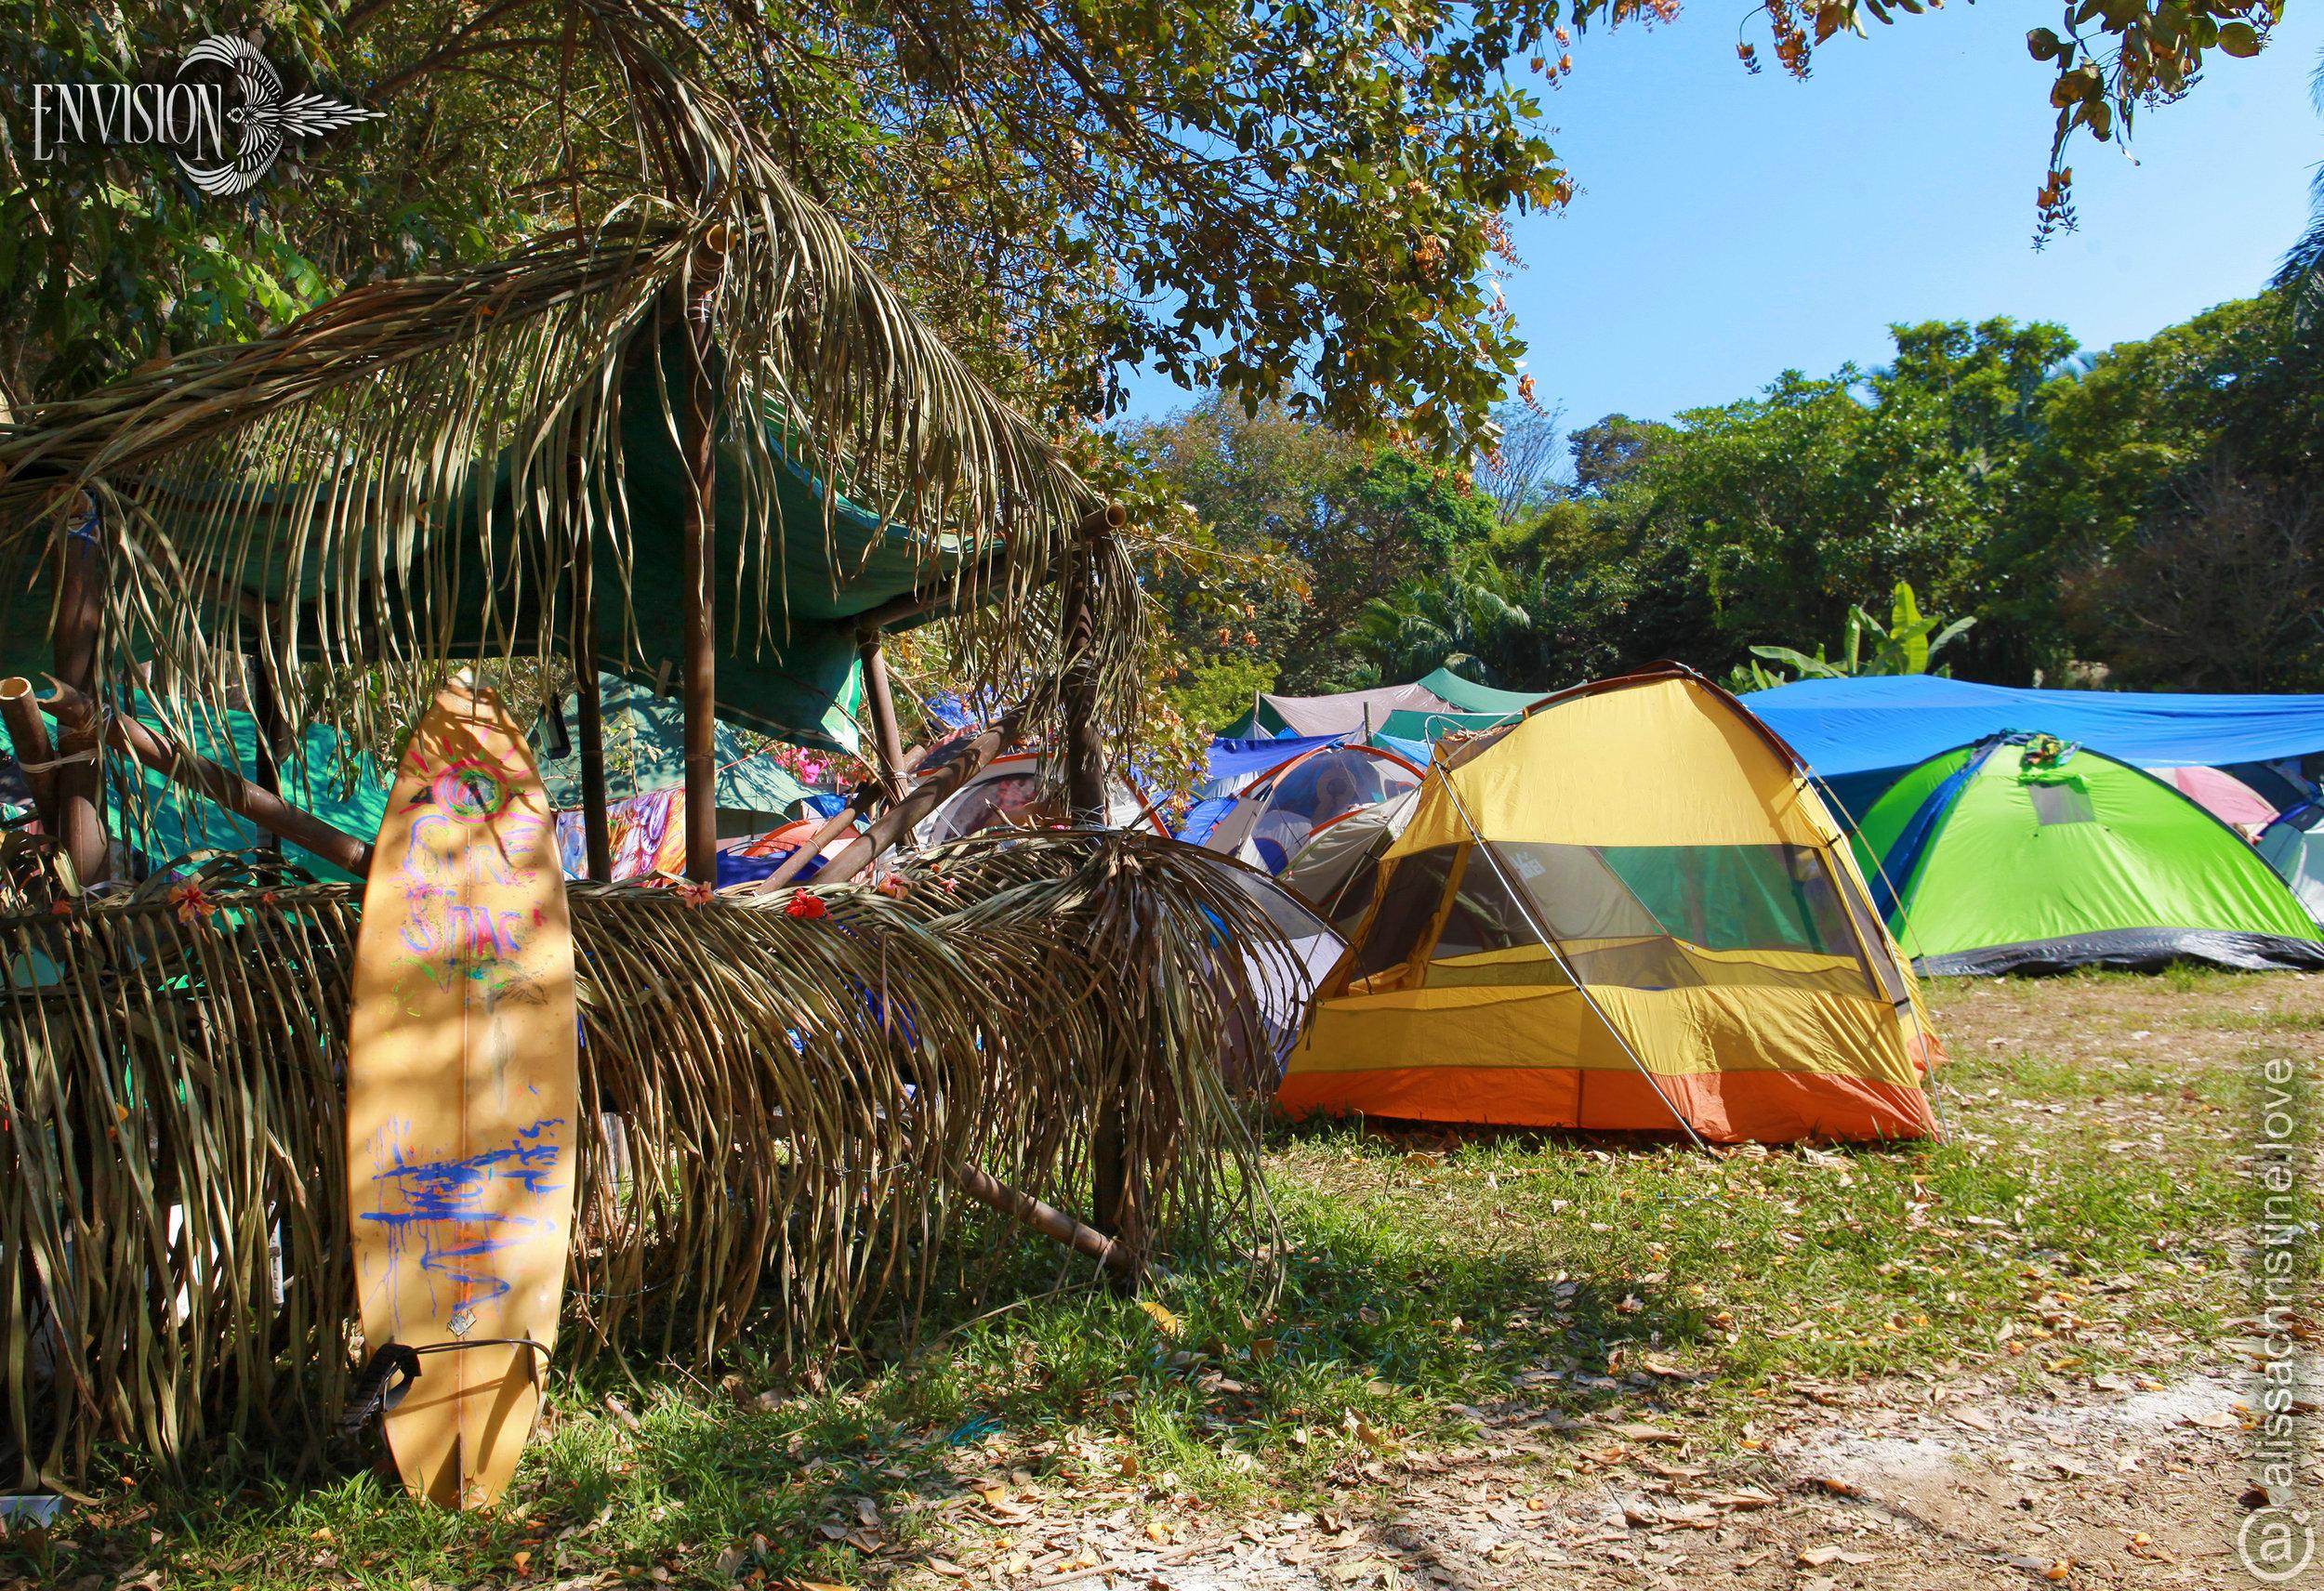 alissaChristine-ef-camping-2017-8468-lo.jpg